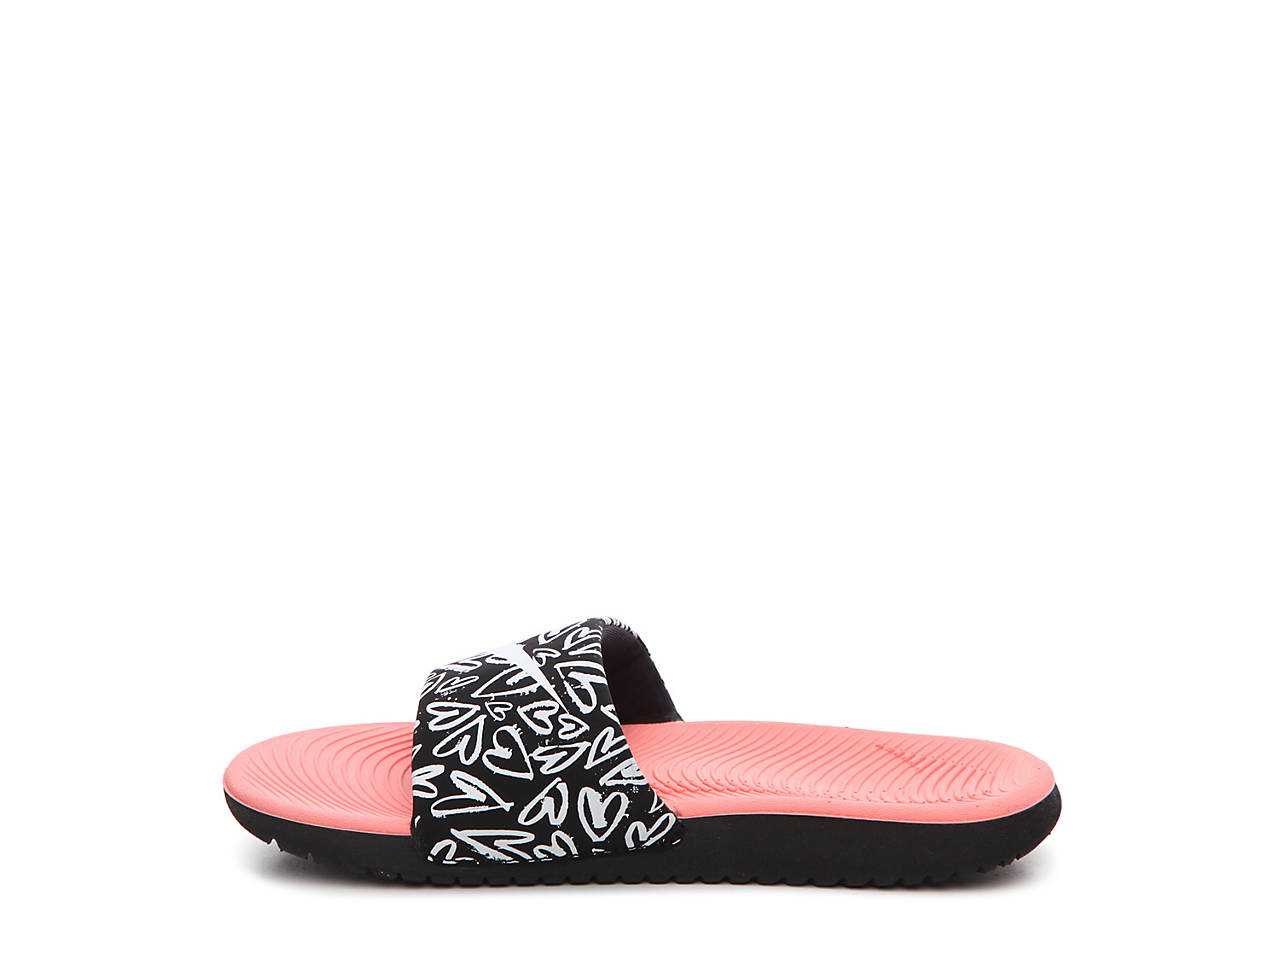 6912fb5b0 Nike Kawa Print Toddler   Youth Slide Sandal Kids Shoes